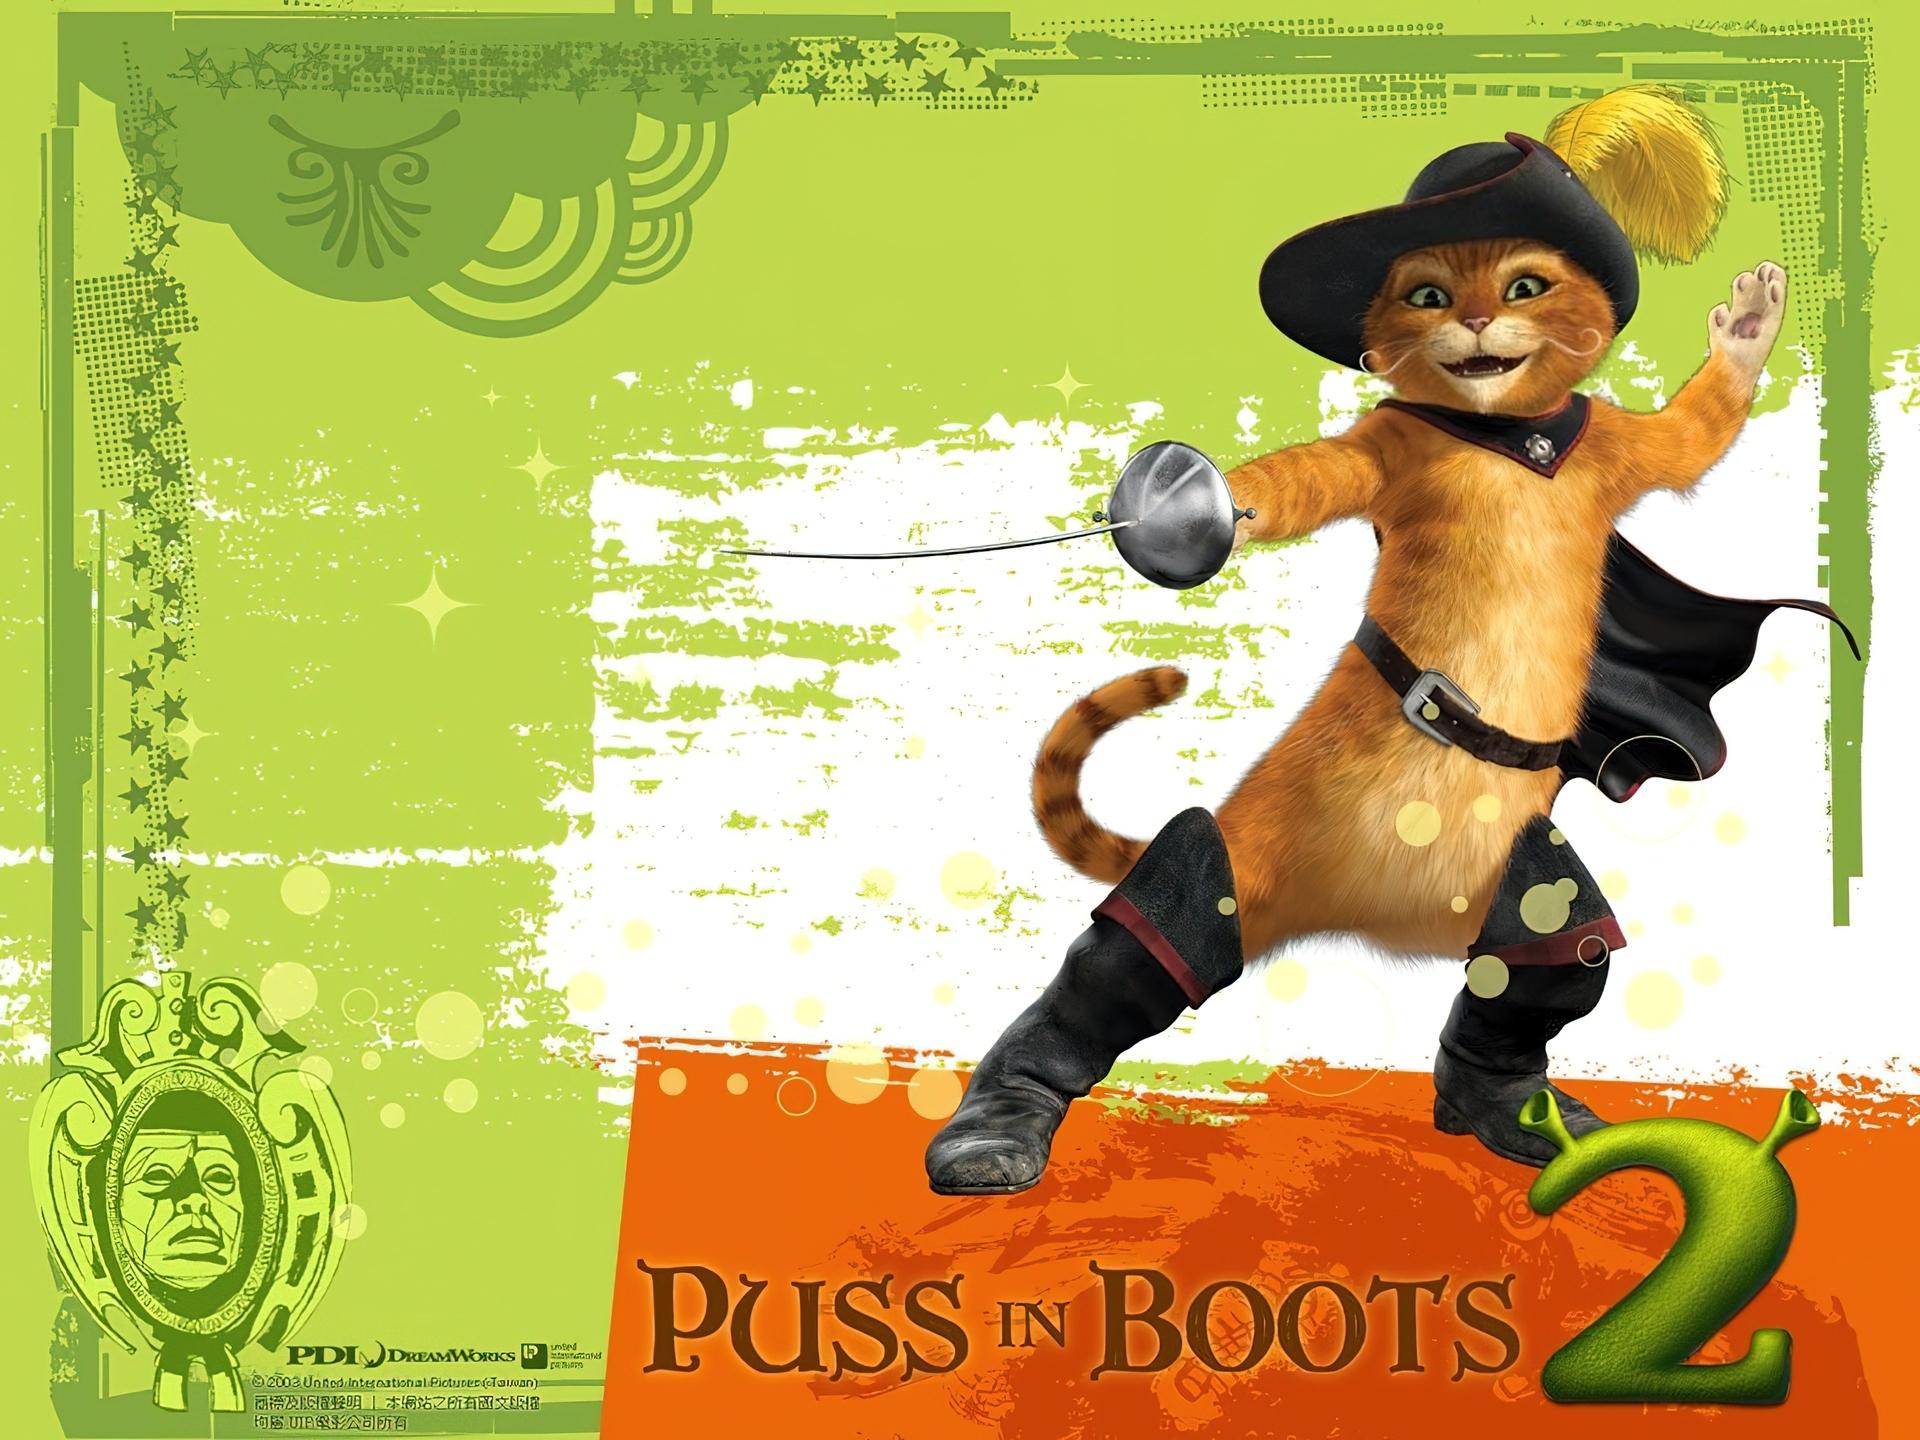 Kot W Butach Shrek 2